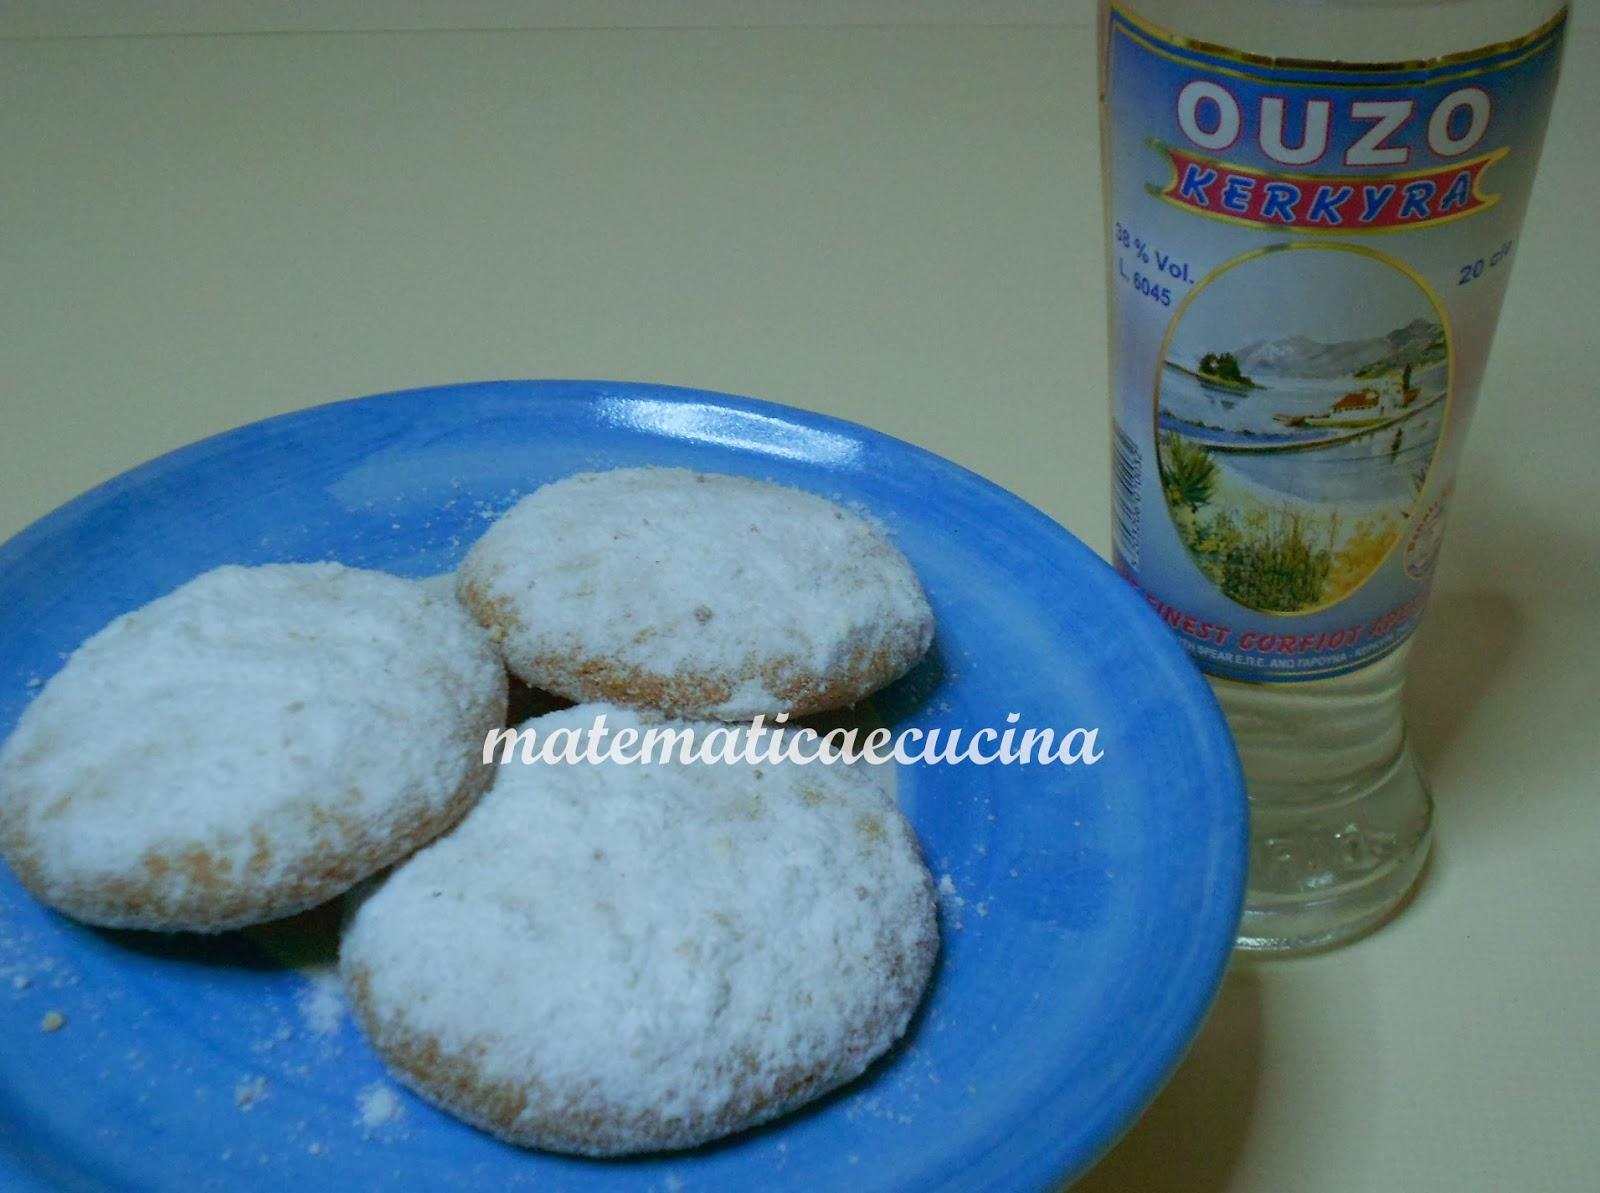 kourabiedes- biscotti natalizi greci ricoperti di zucchero a velo